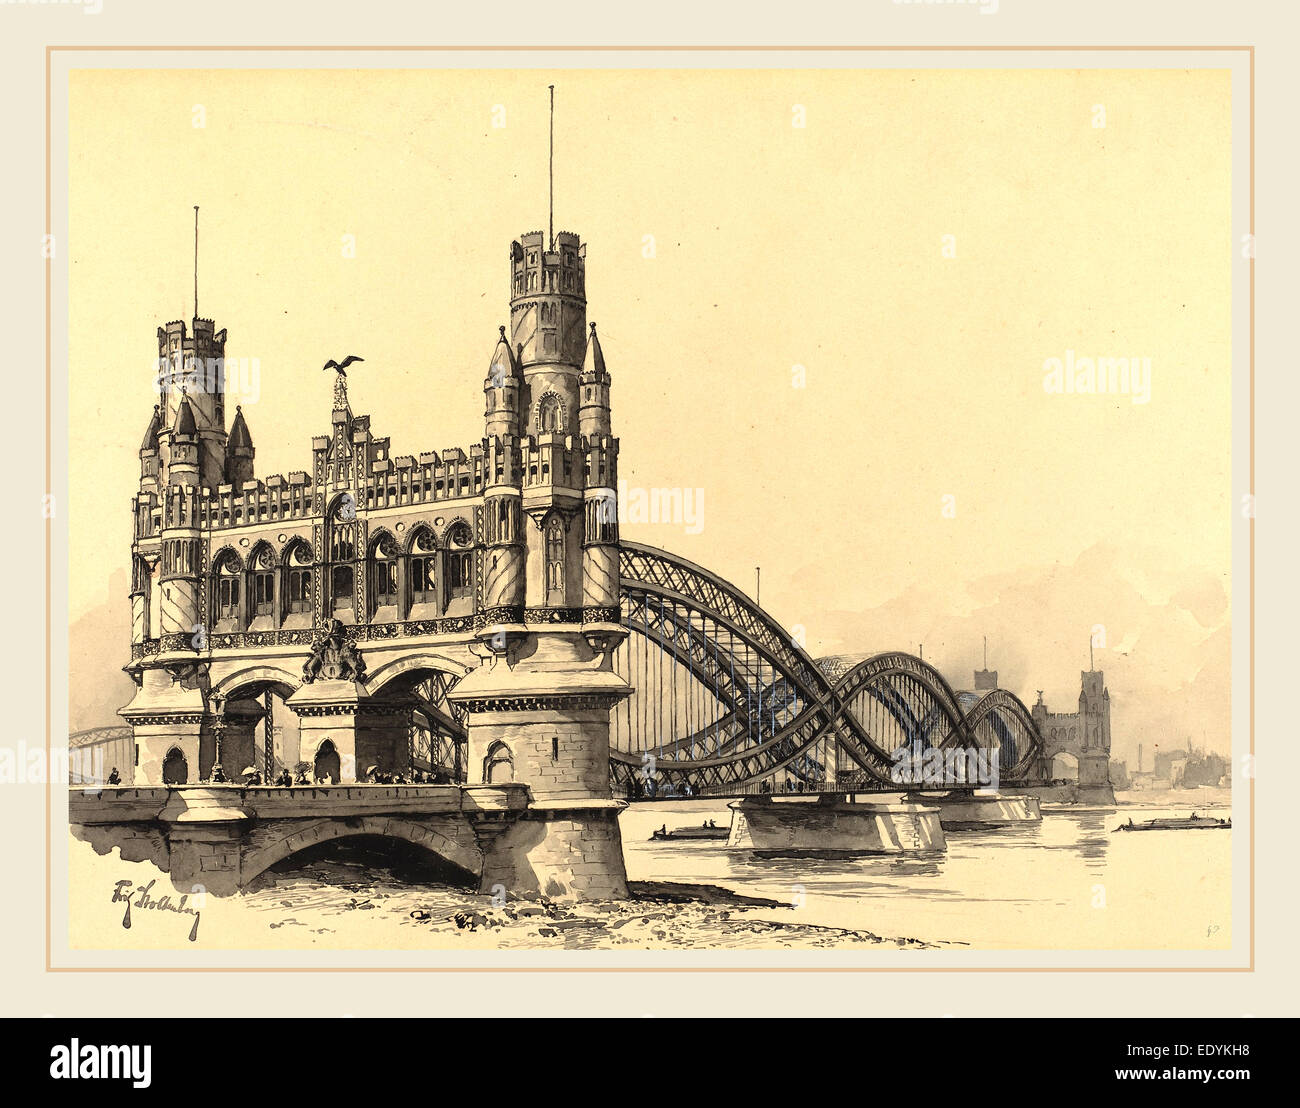 Fritz Stoltenberg, German (1855-1921), Elbbrucke, 1893, watercolor - Stock Image